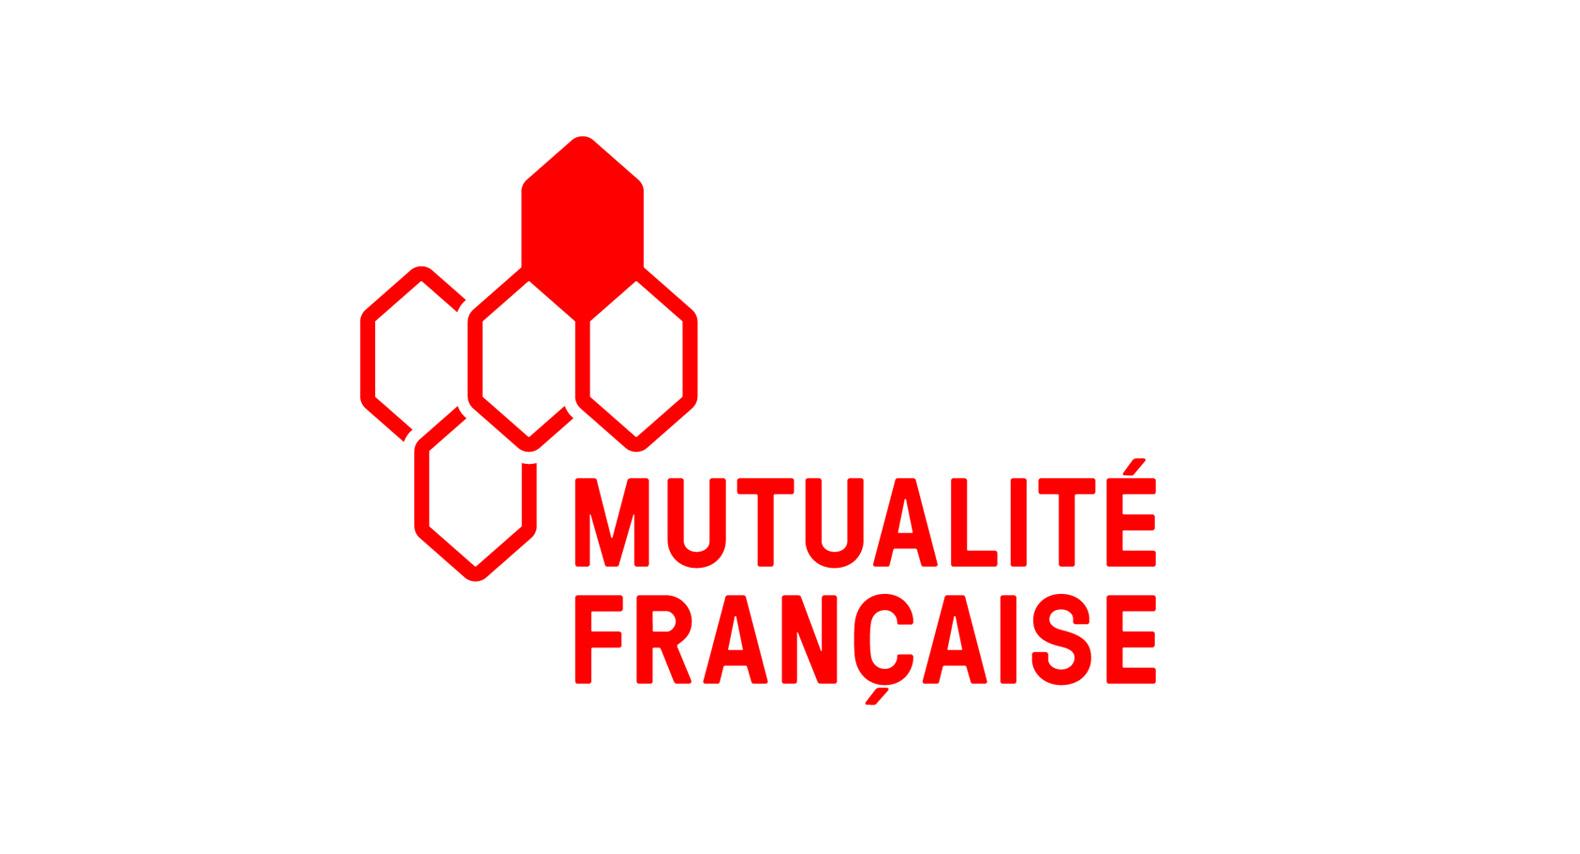 La Federation Nationale De La Mutualite Francaise Mutualite Fr